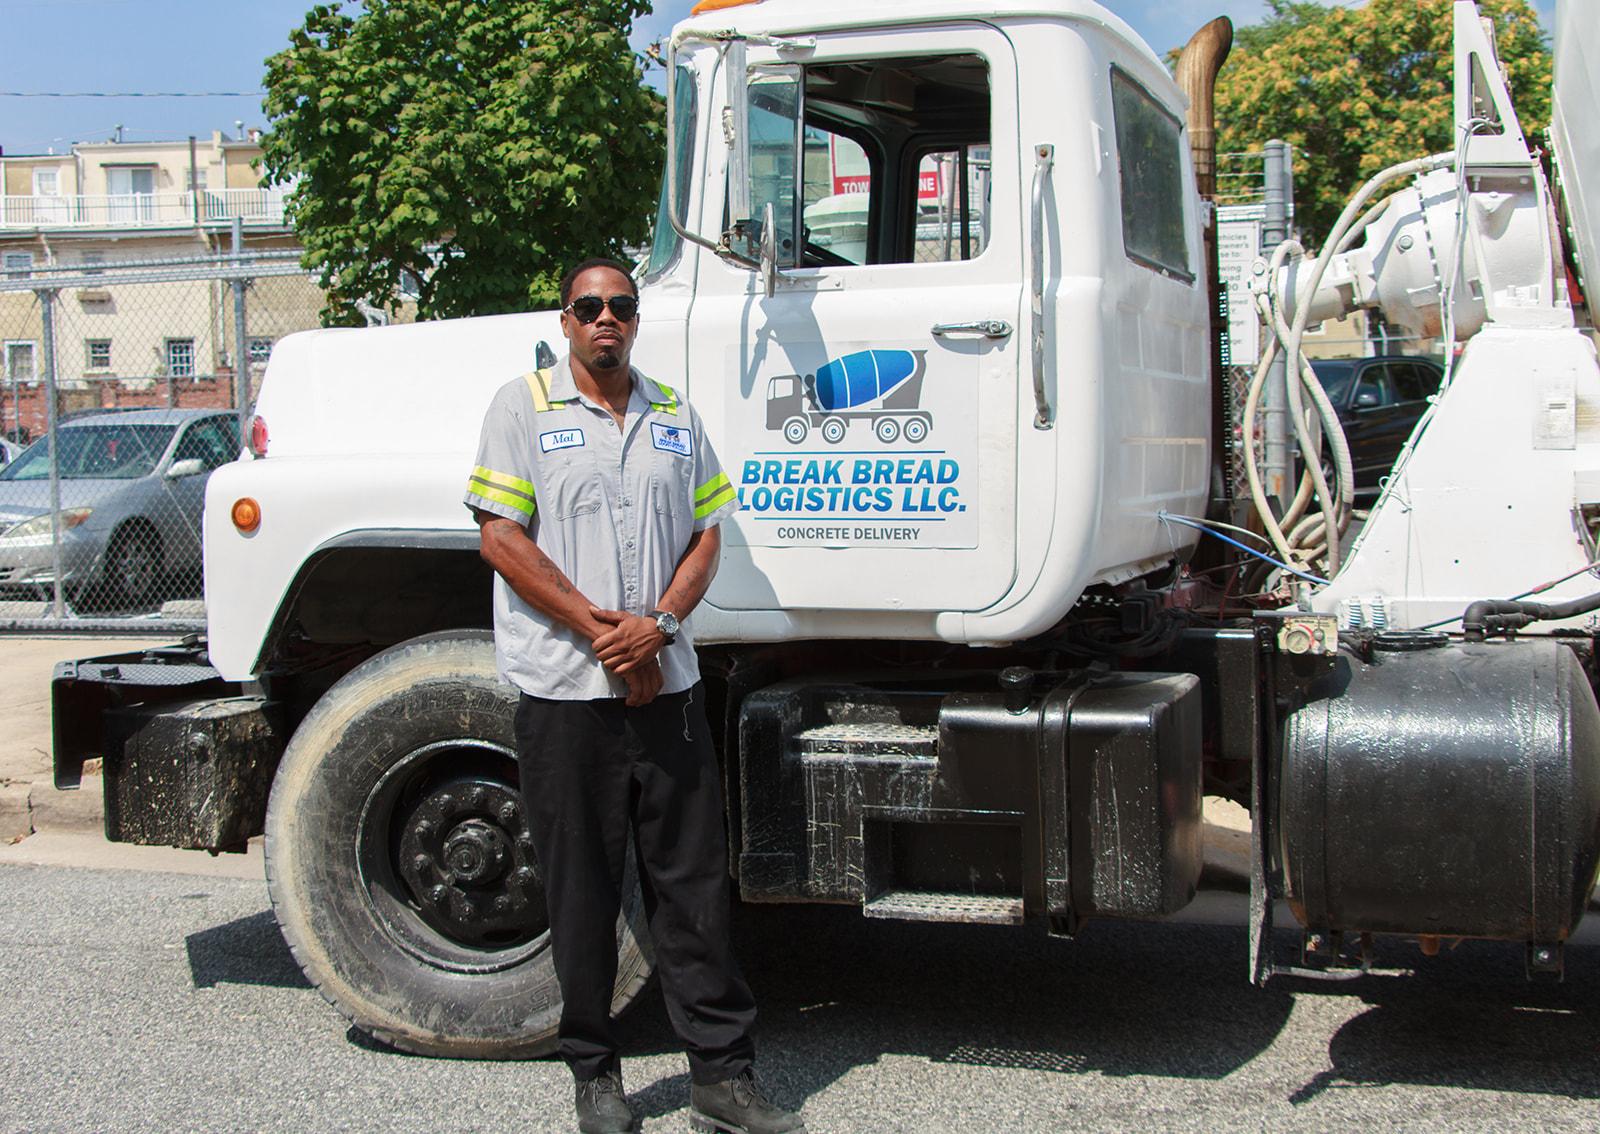 DPW Small Business 8.10.18-46.jpg